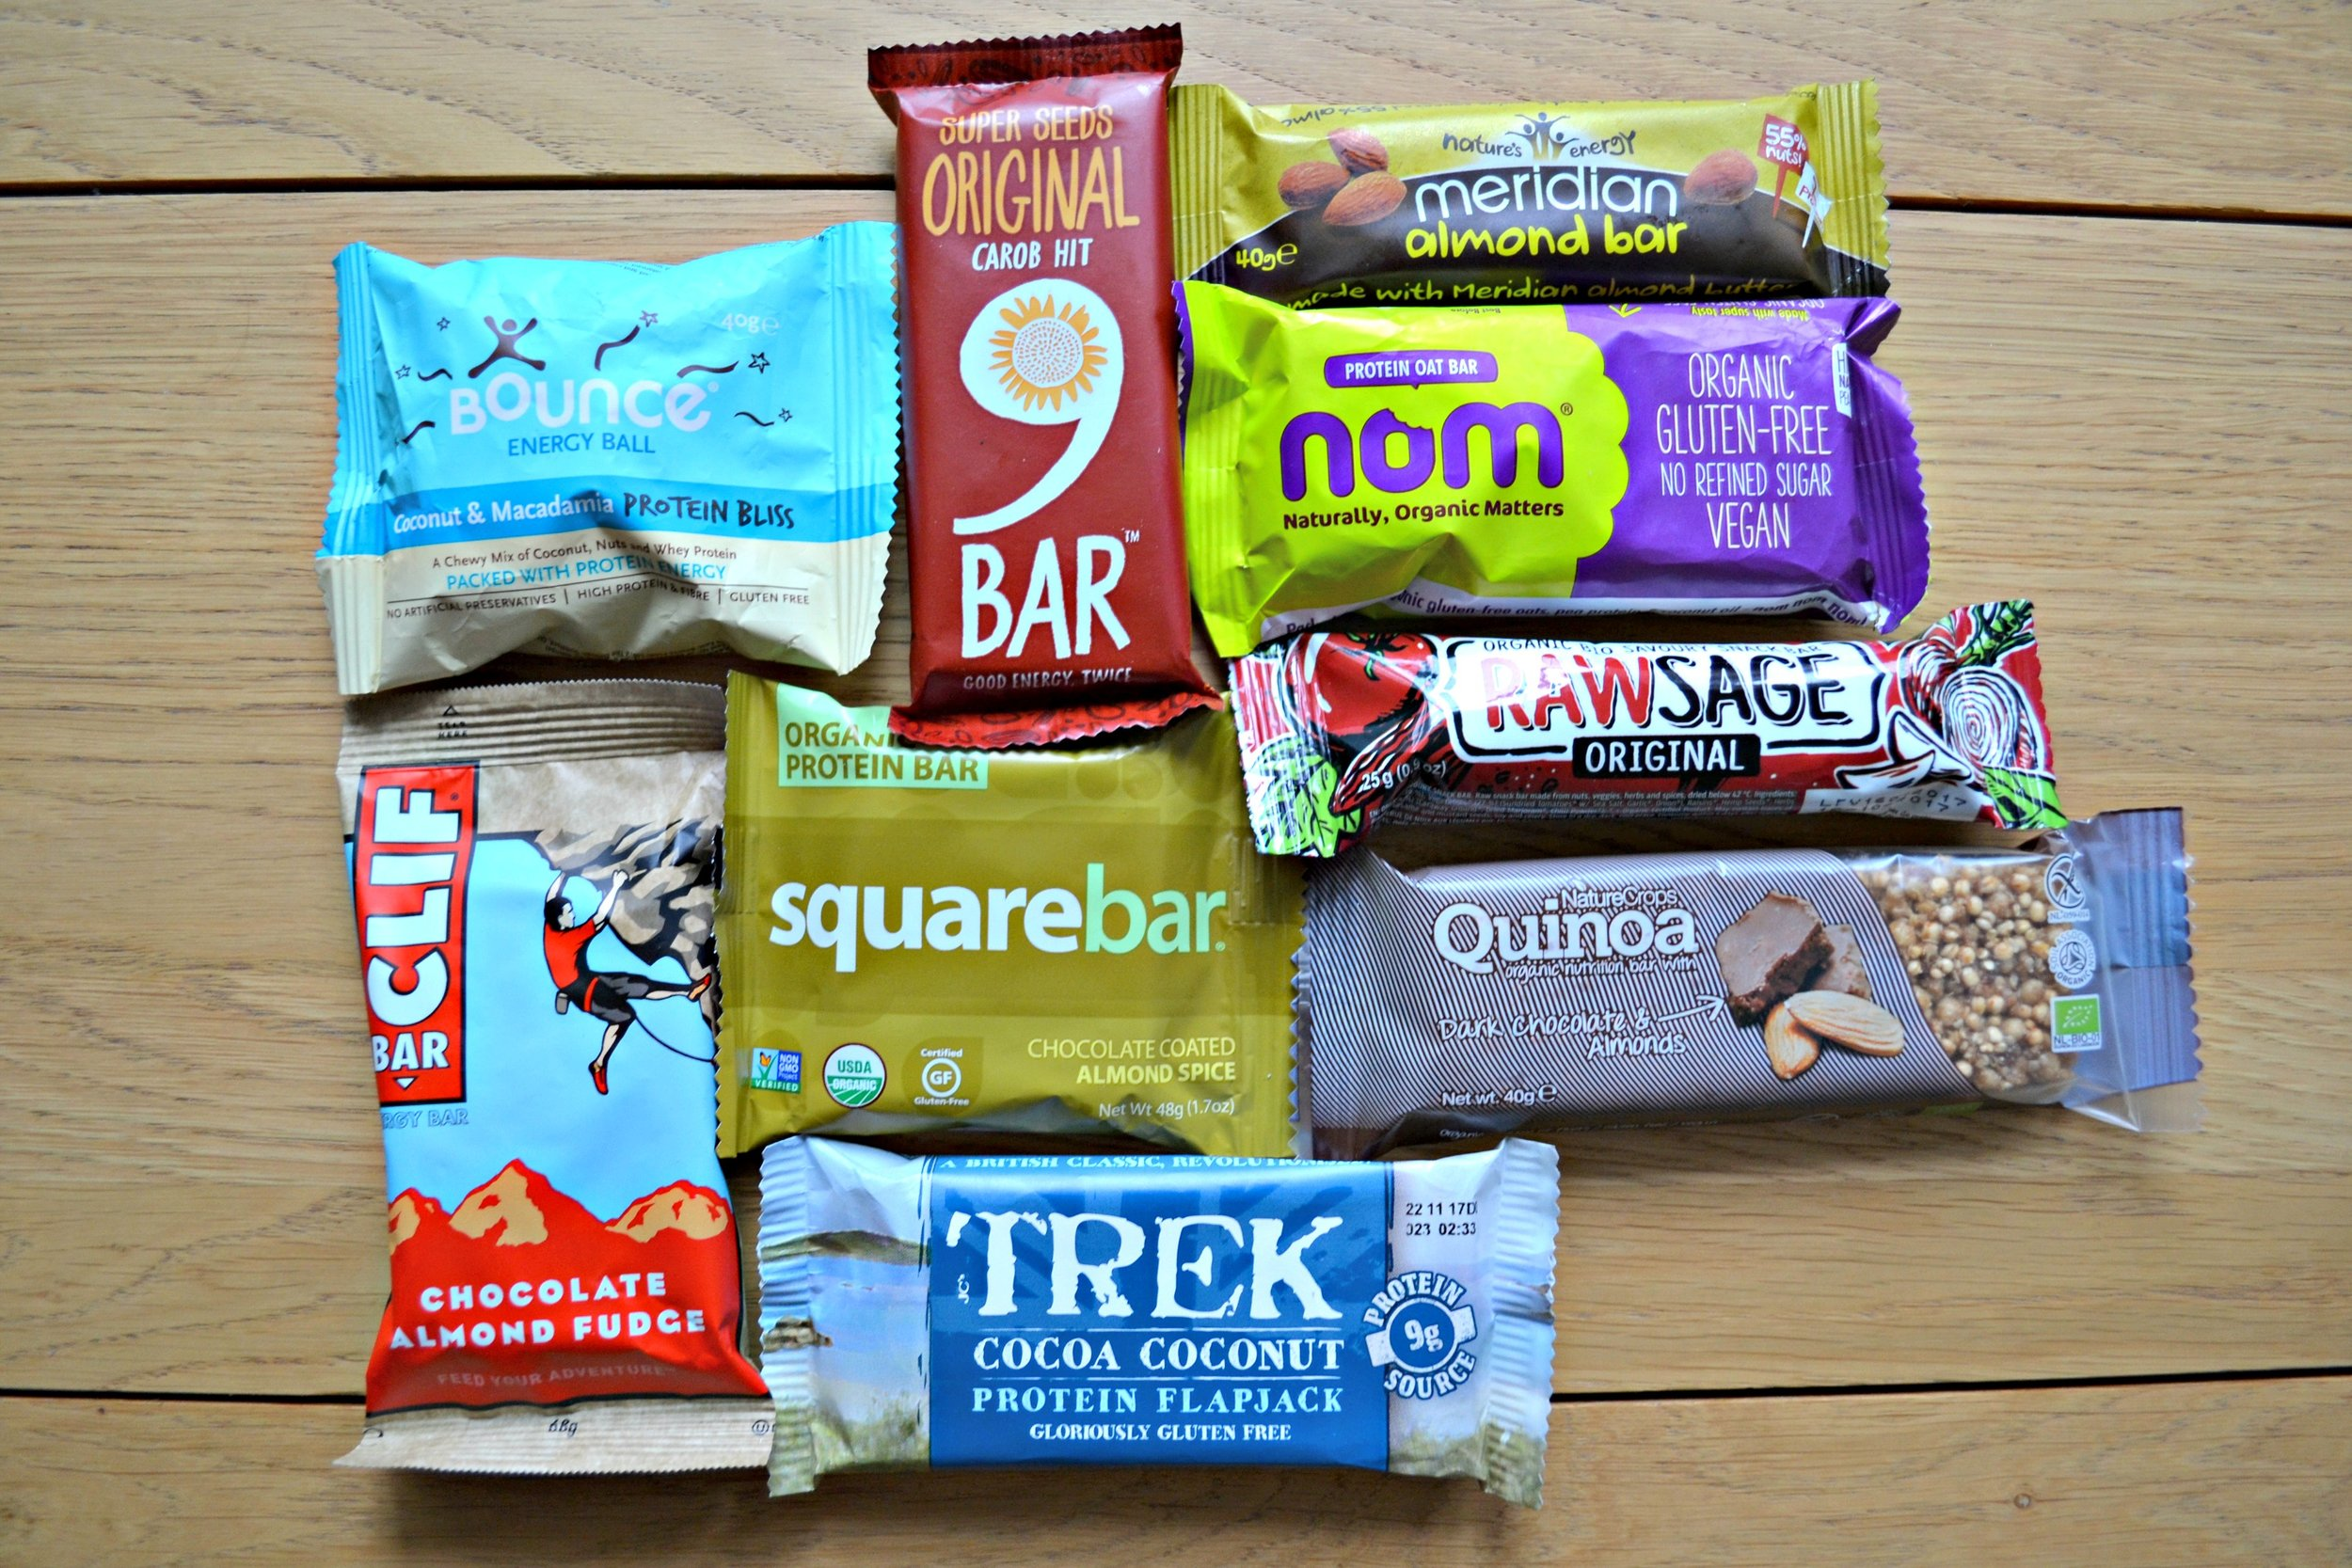 Fruit free snack bar reviews | The Flourishing Pantry | healthy eating blog